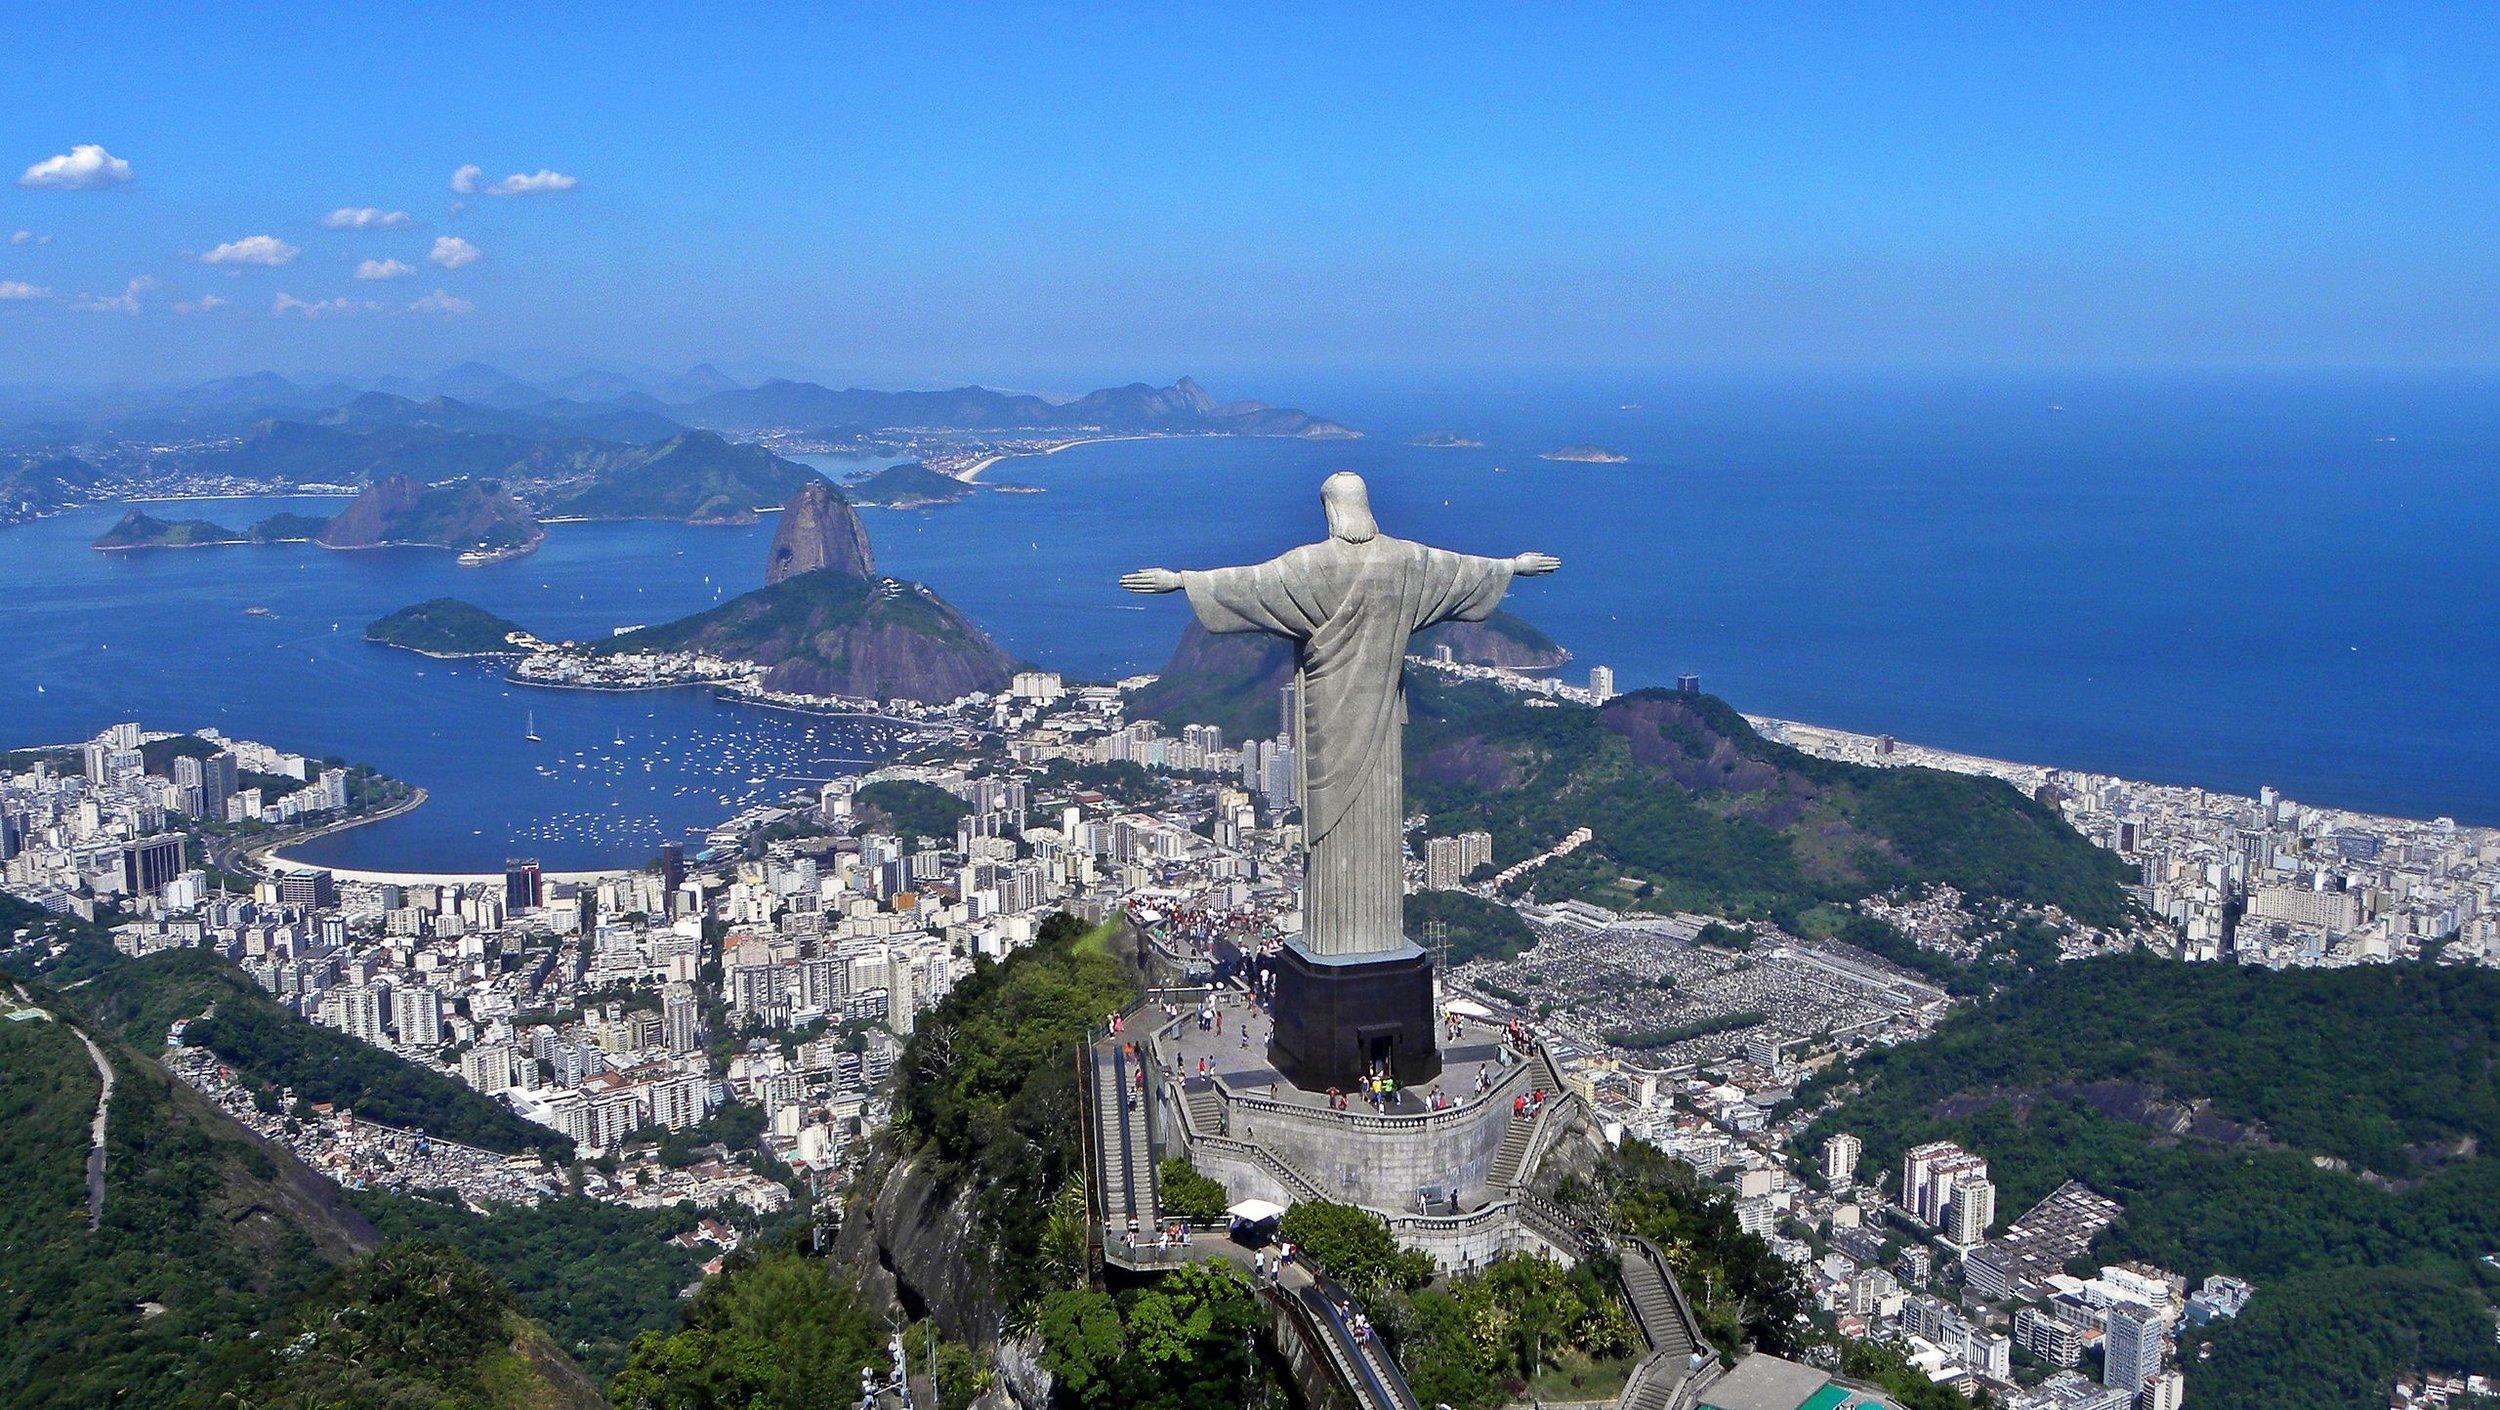 Christ_on_Corcovado_mountain.jpg